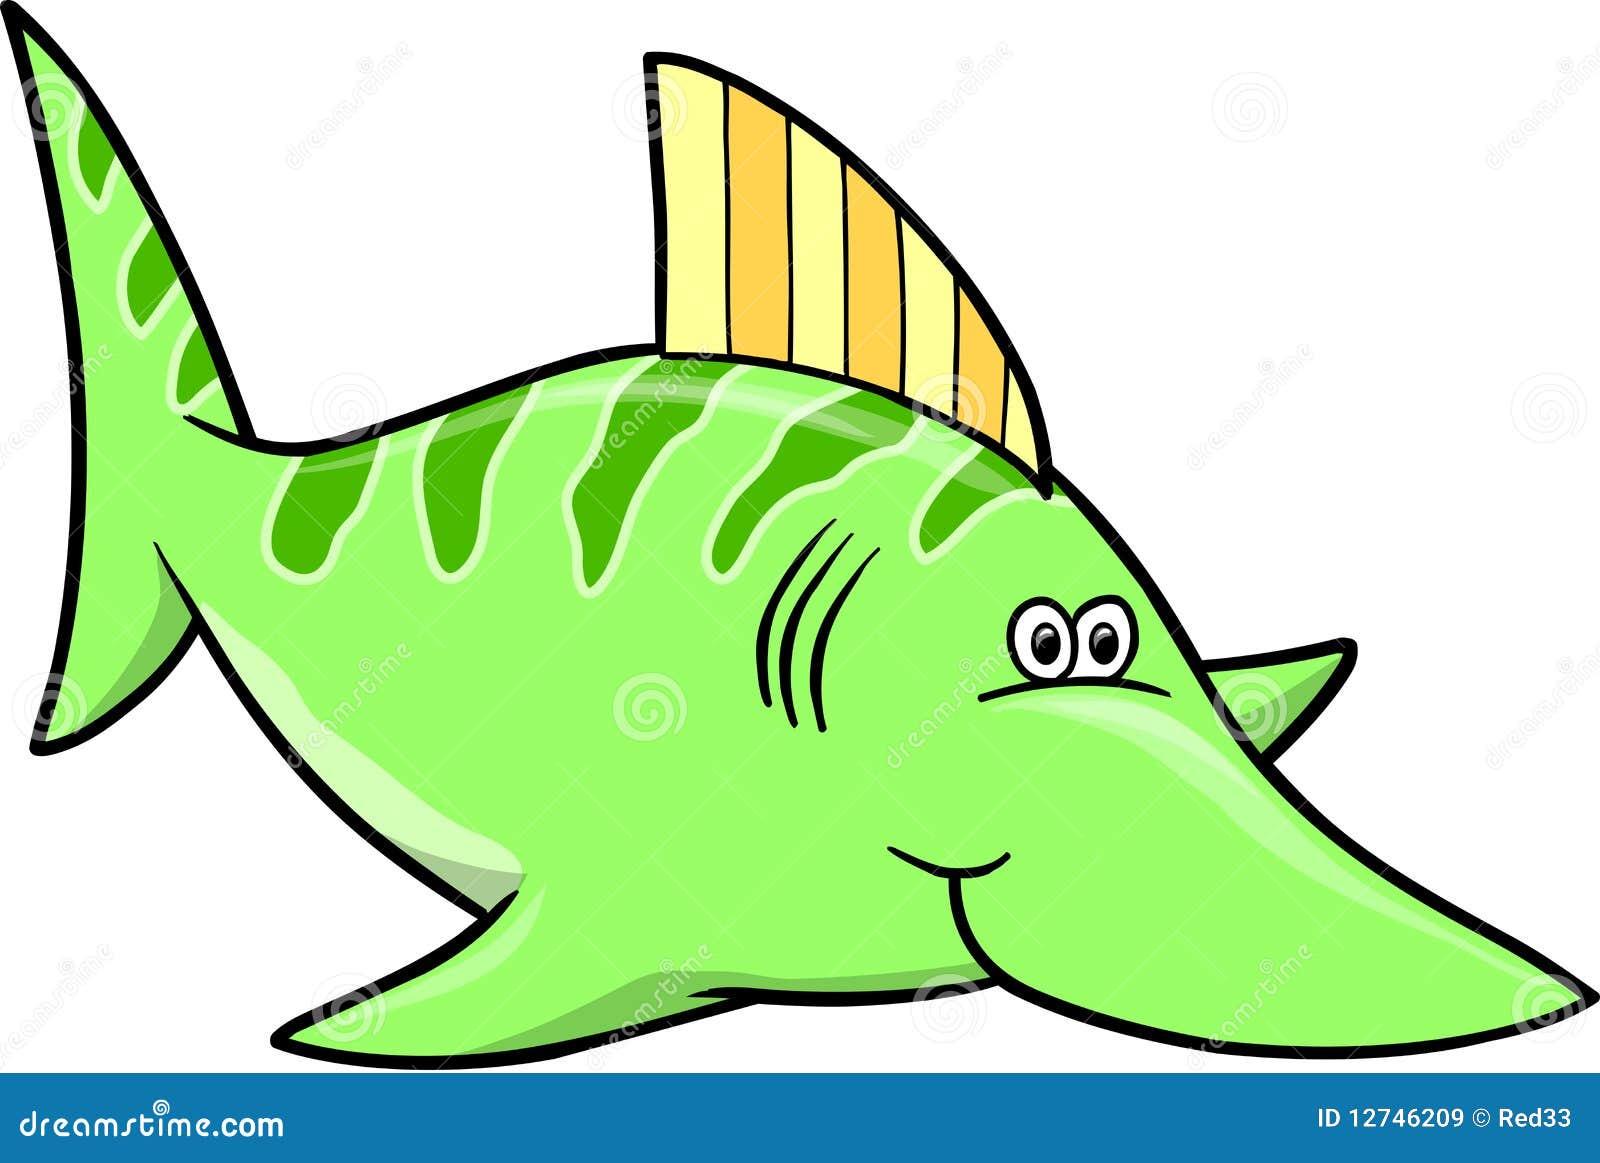 Green Fish Vector Illustration Stock Vector - Image: 12746209